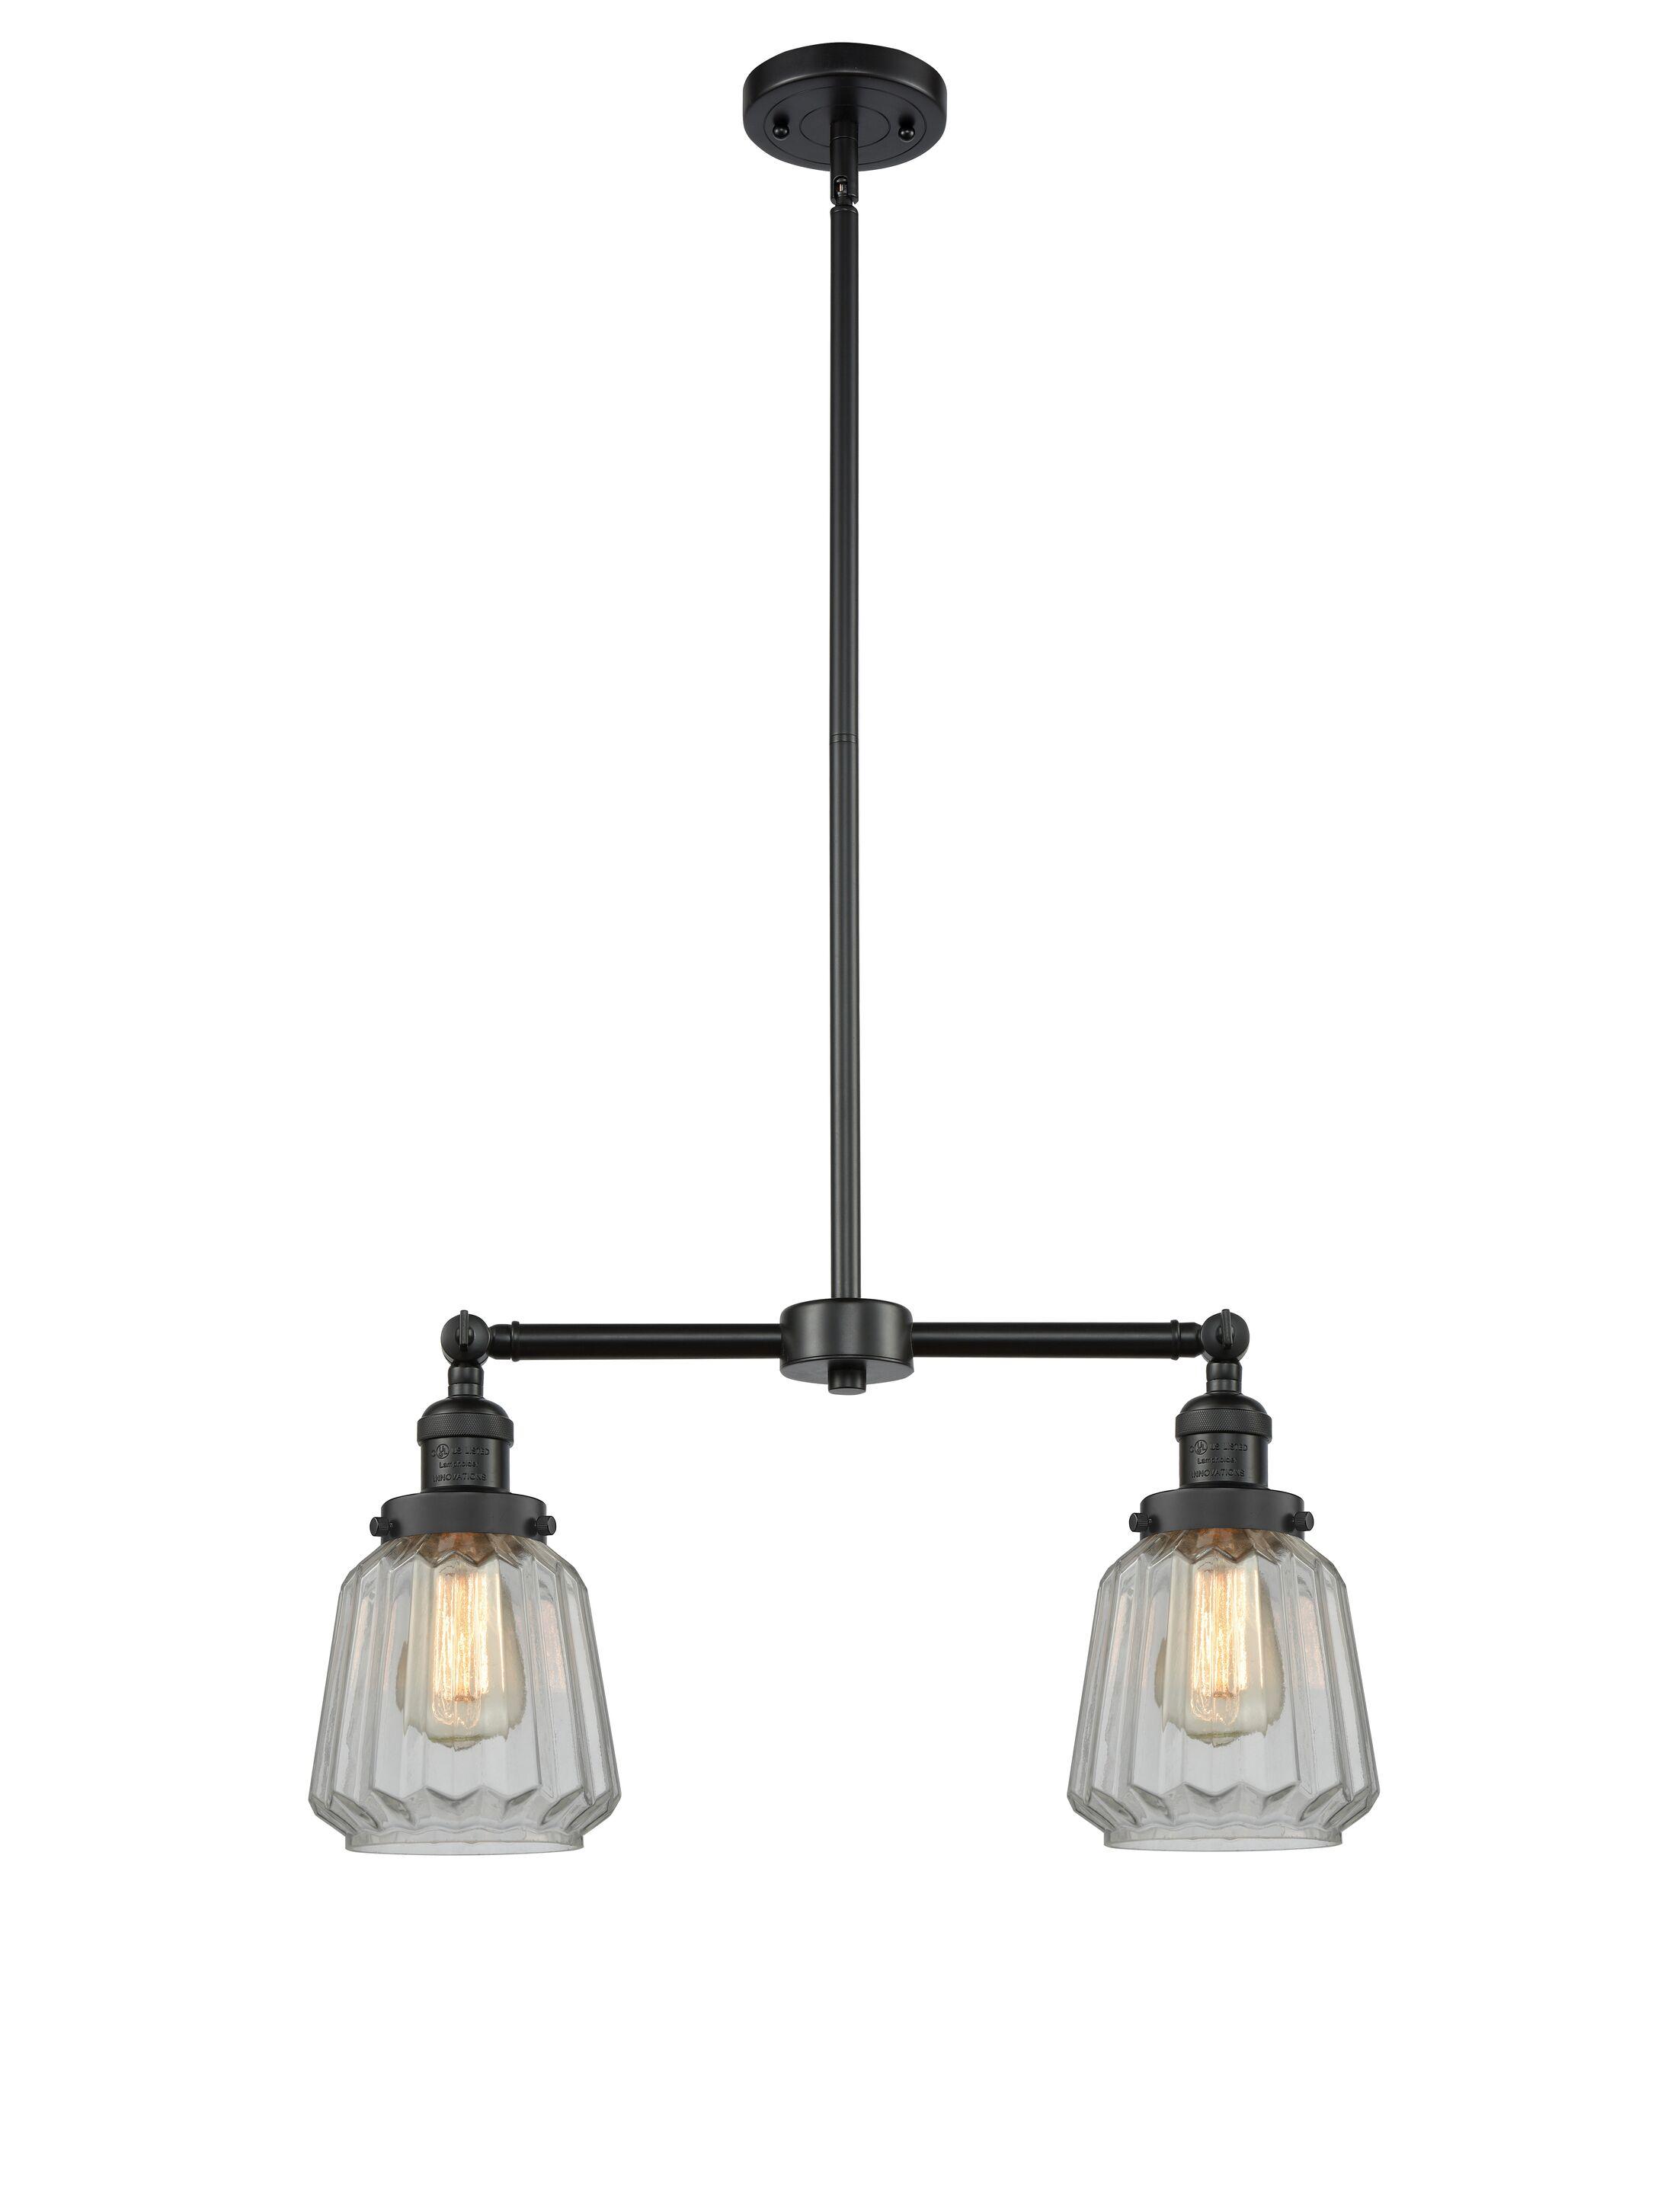 Vinson 2-Light Kitchen Island Pendant Bulb Type: LED, Shade Color: Mercury Plated, Finish: Antique Copper